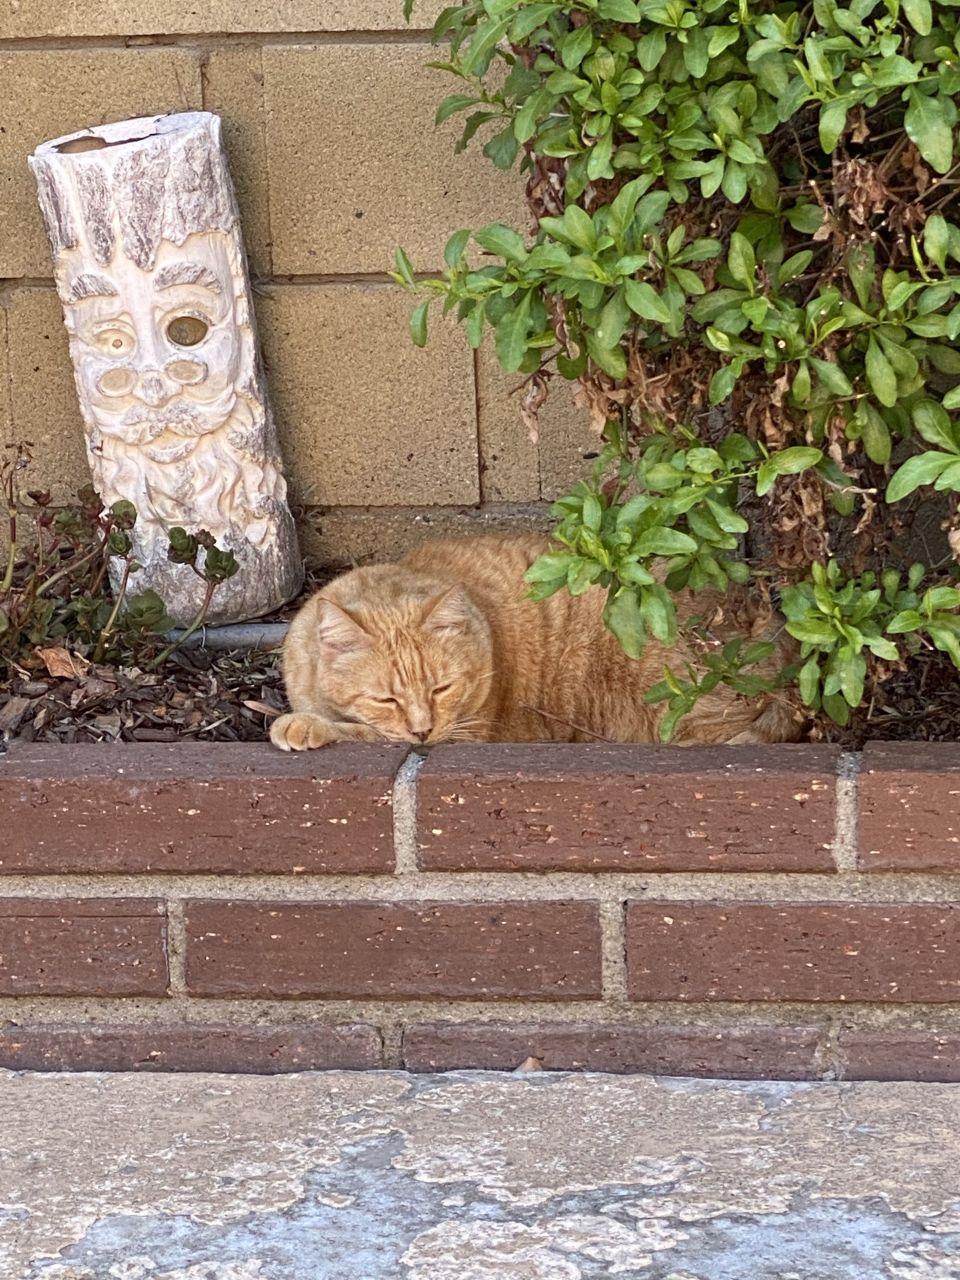 My favorite cat, pickle ❤️